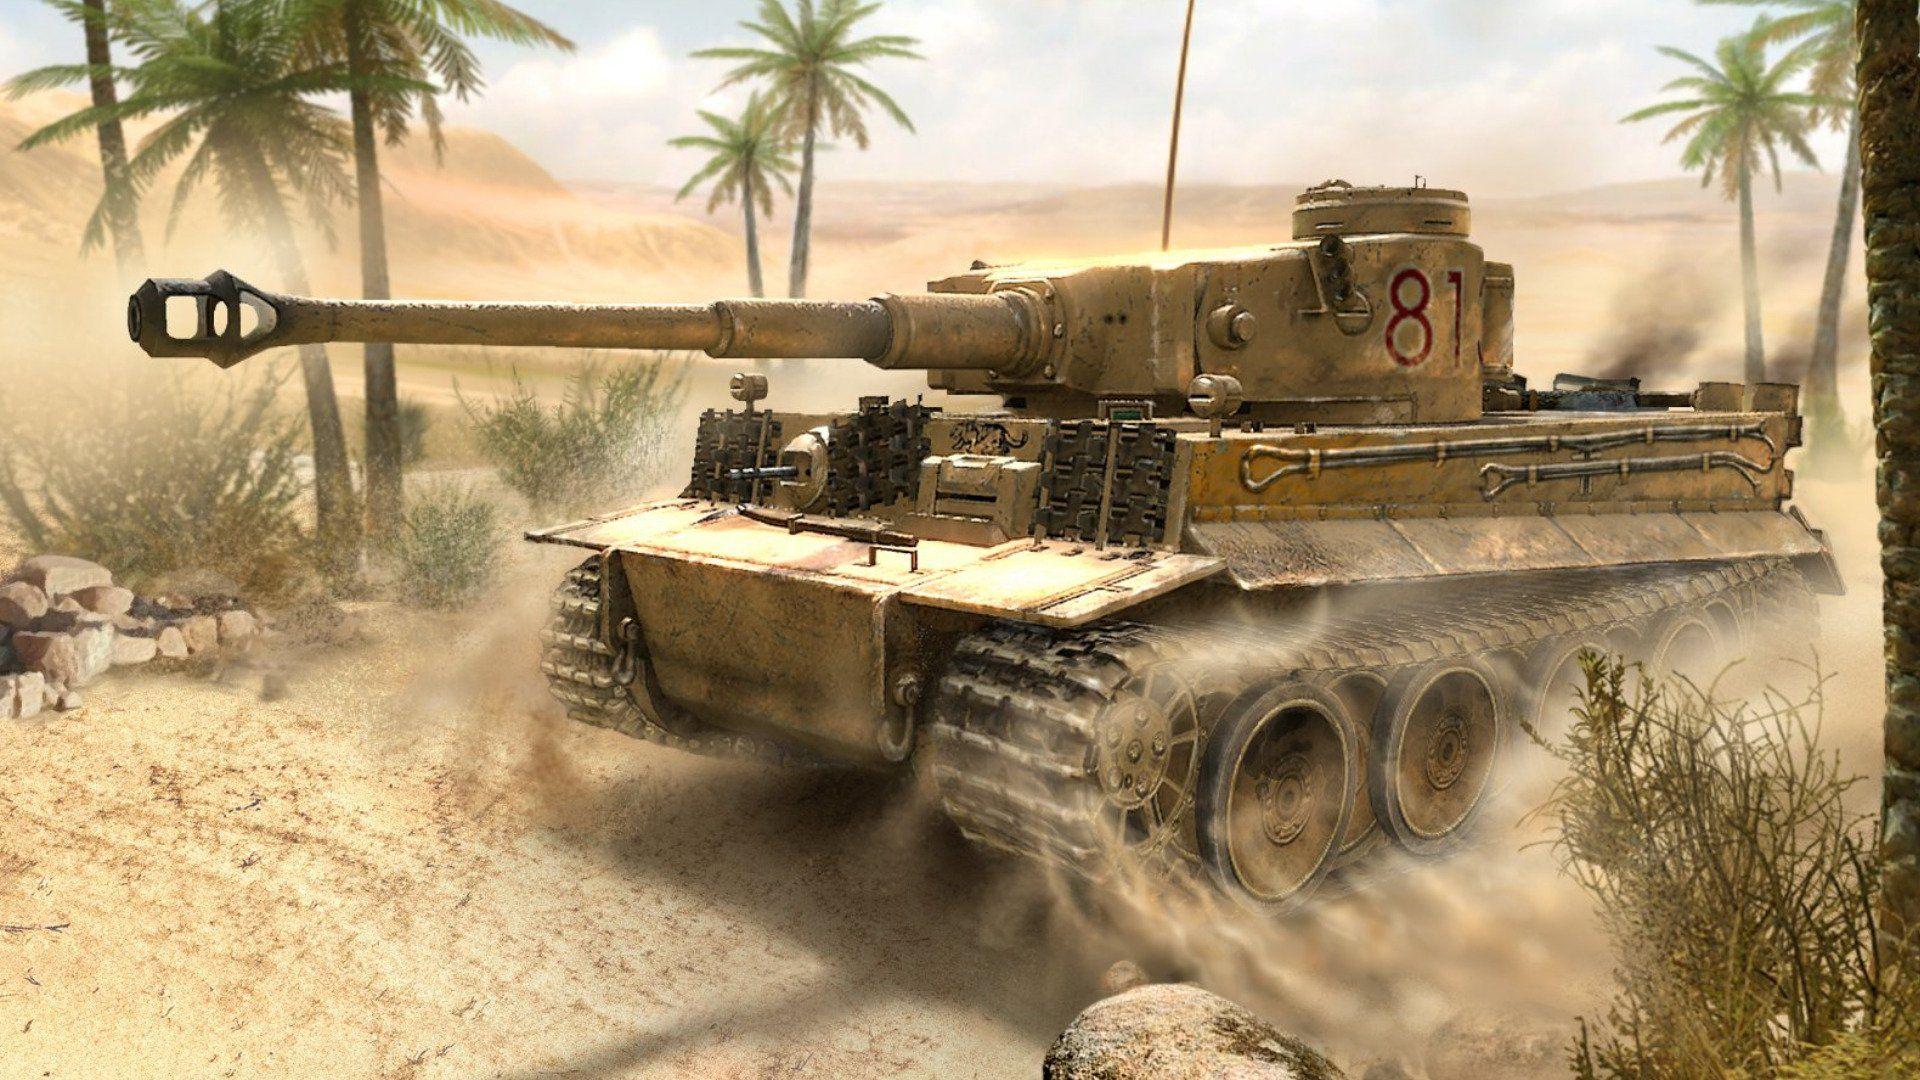 Military Tank Wallpaper Tank Wallpaper Tiger Tank Battle Tank